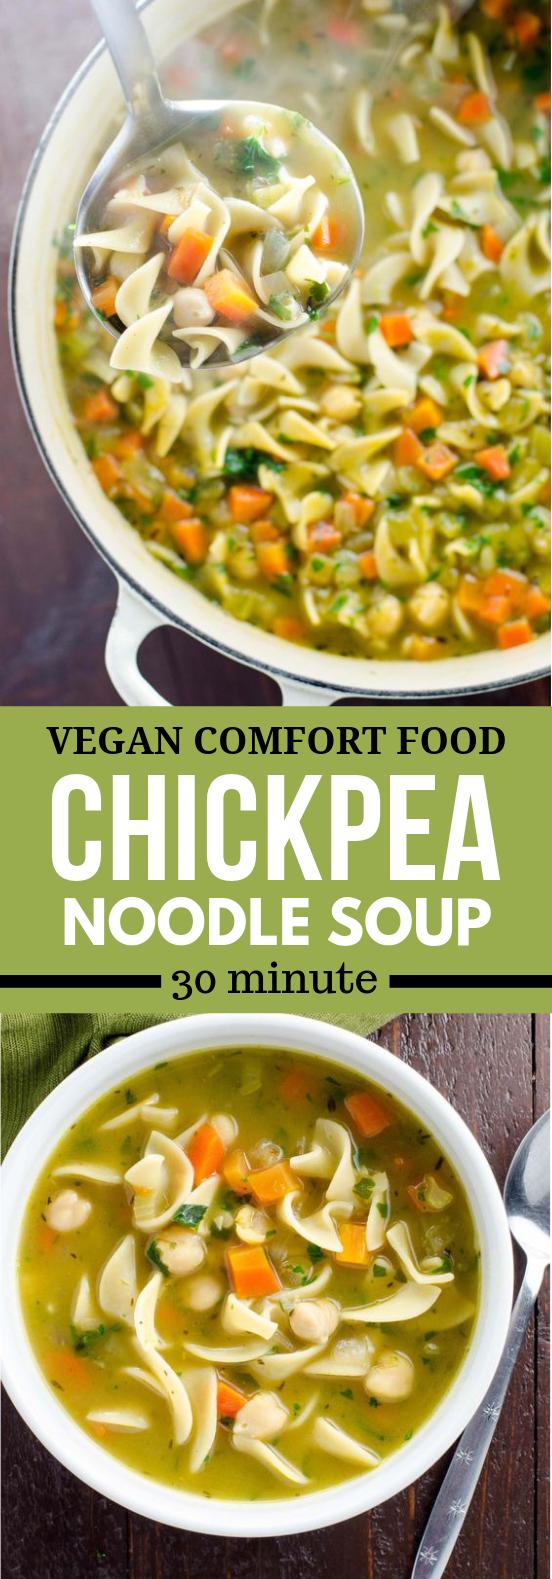 Chickpea Noodle Soup: Vegan Comfort Food #veggies #vegetables